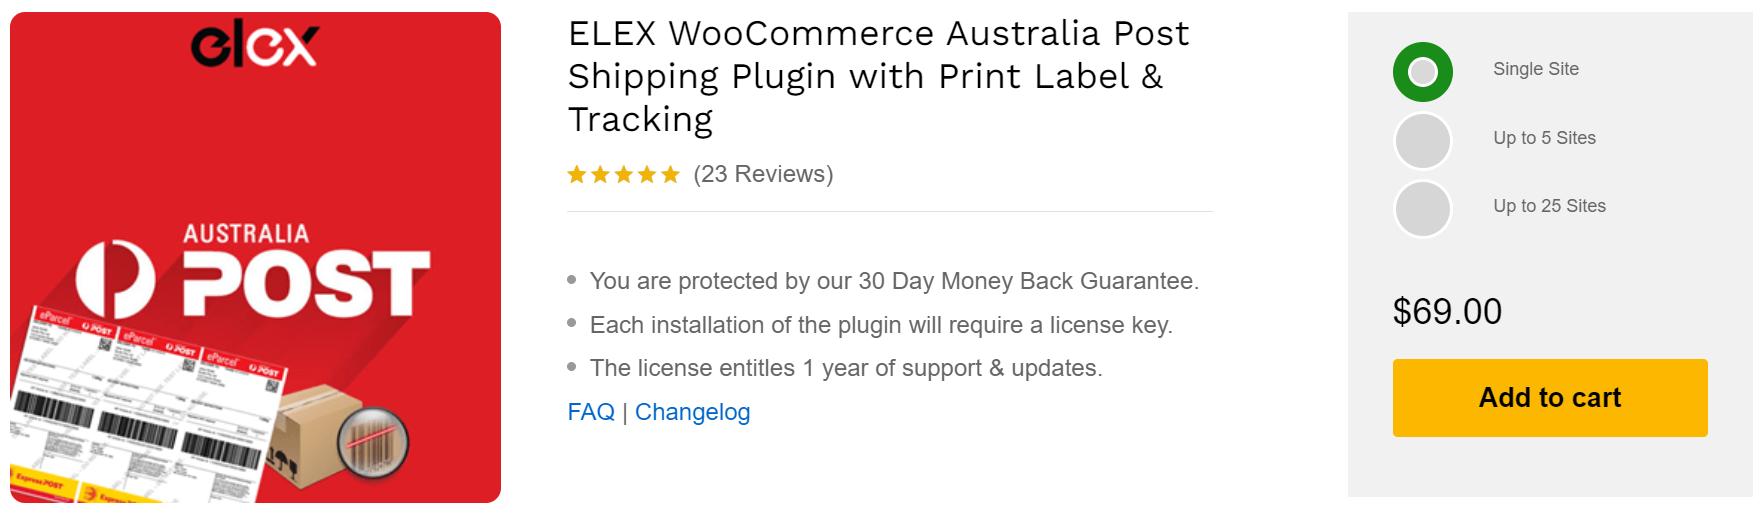 ELEX WooCommerce Australia Post Shipping Plugin